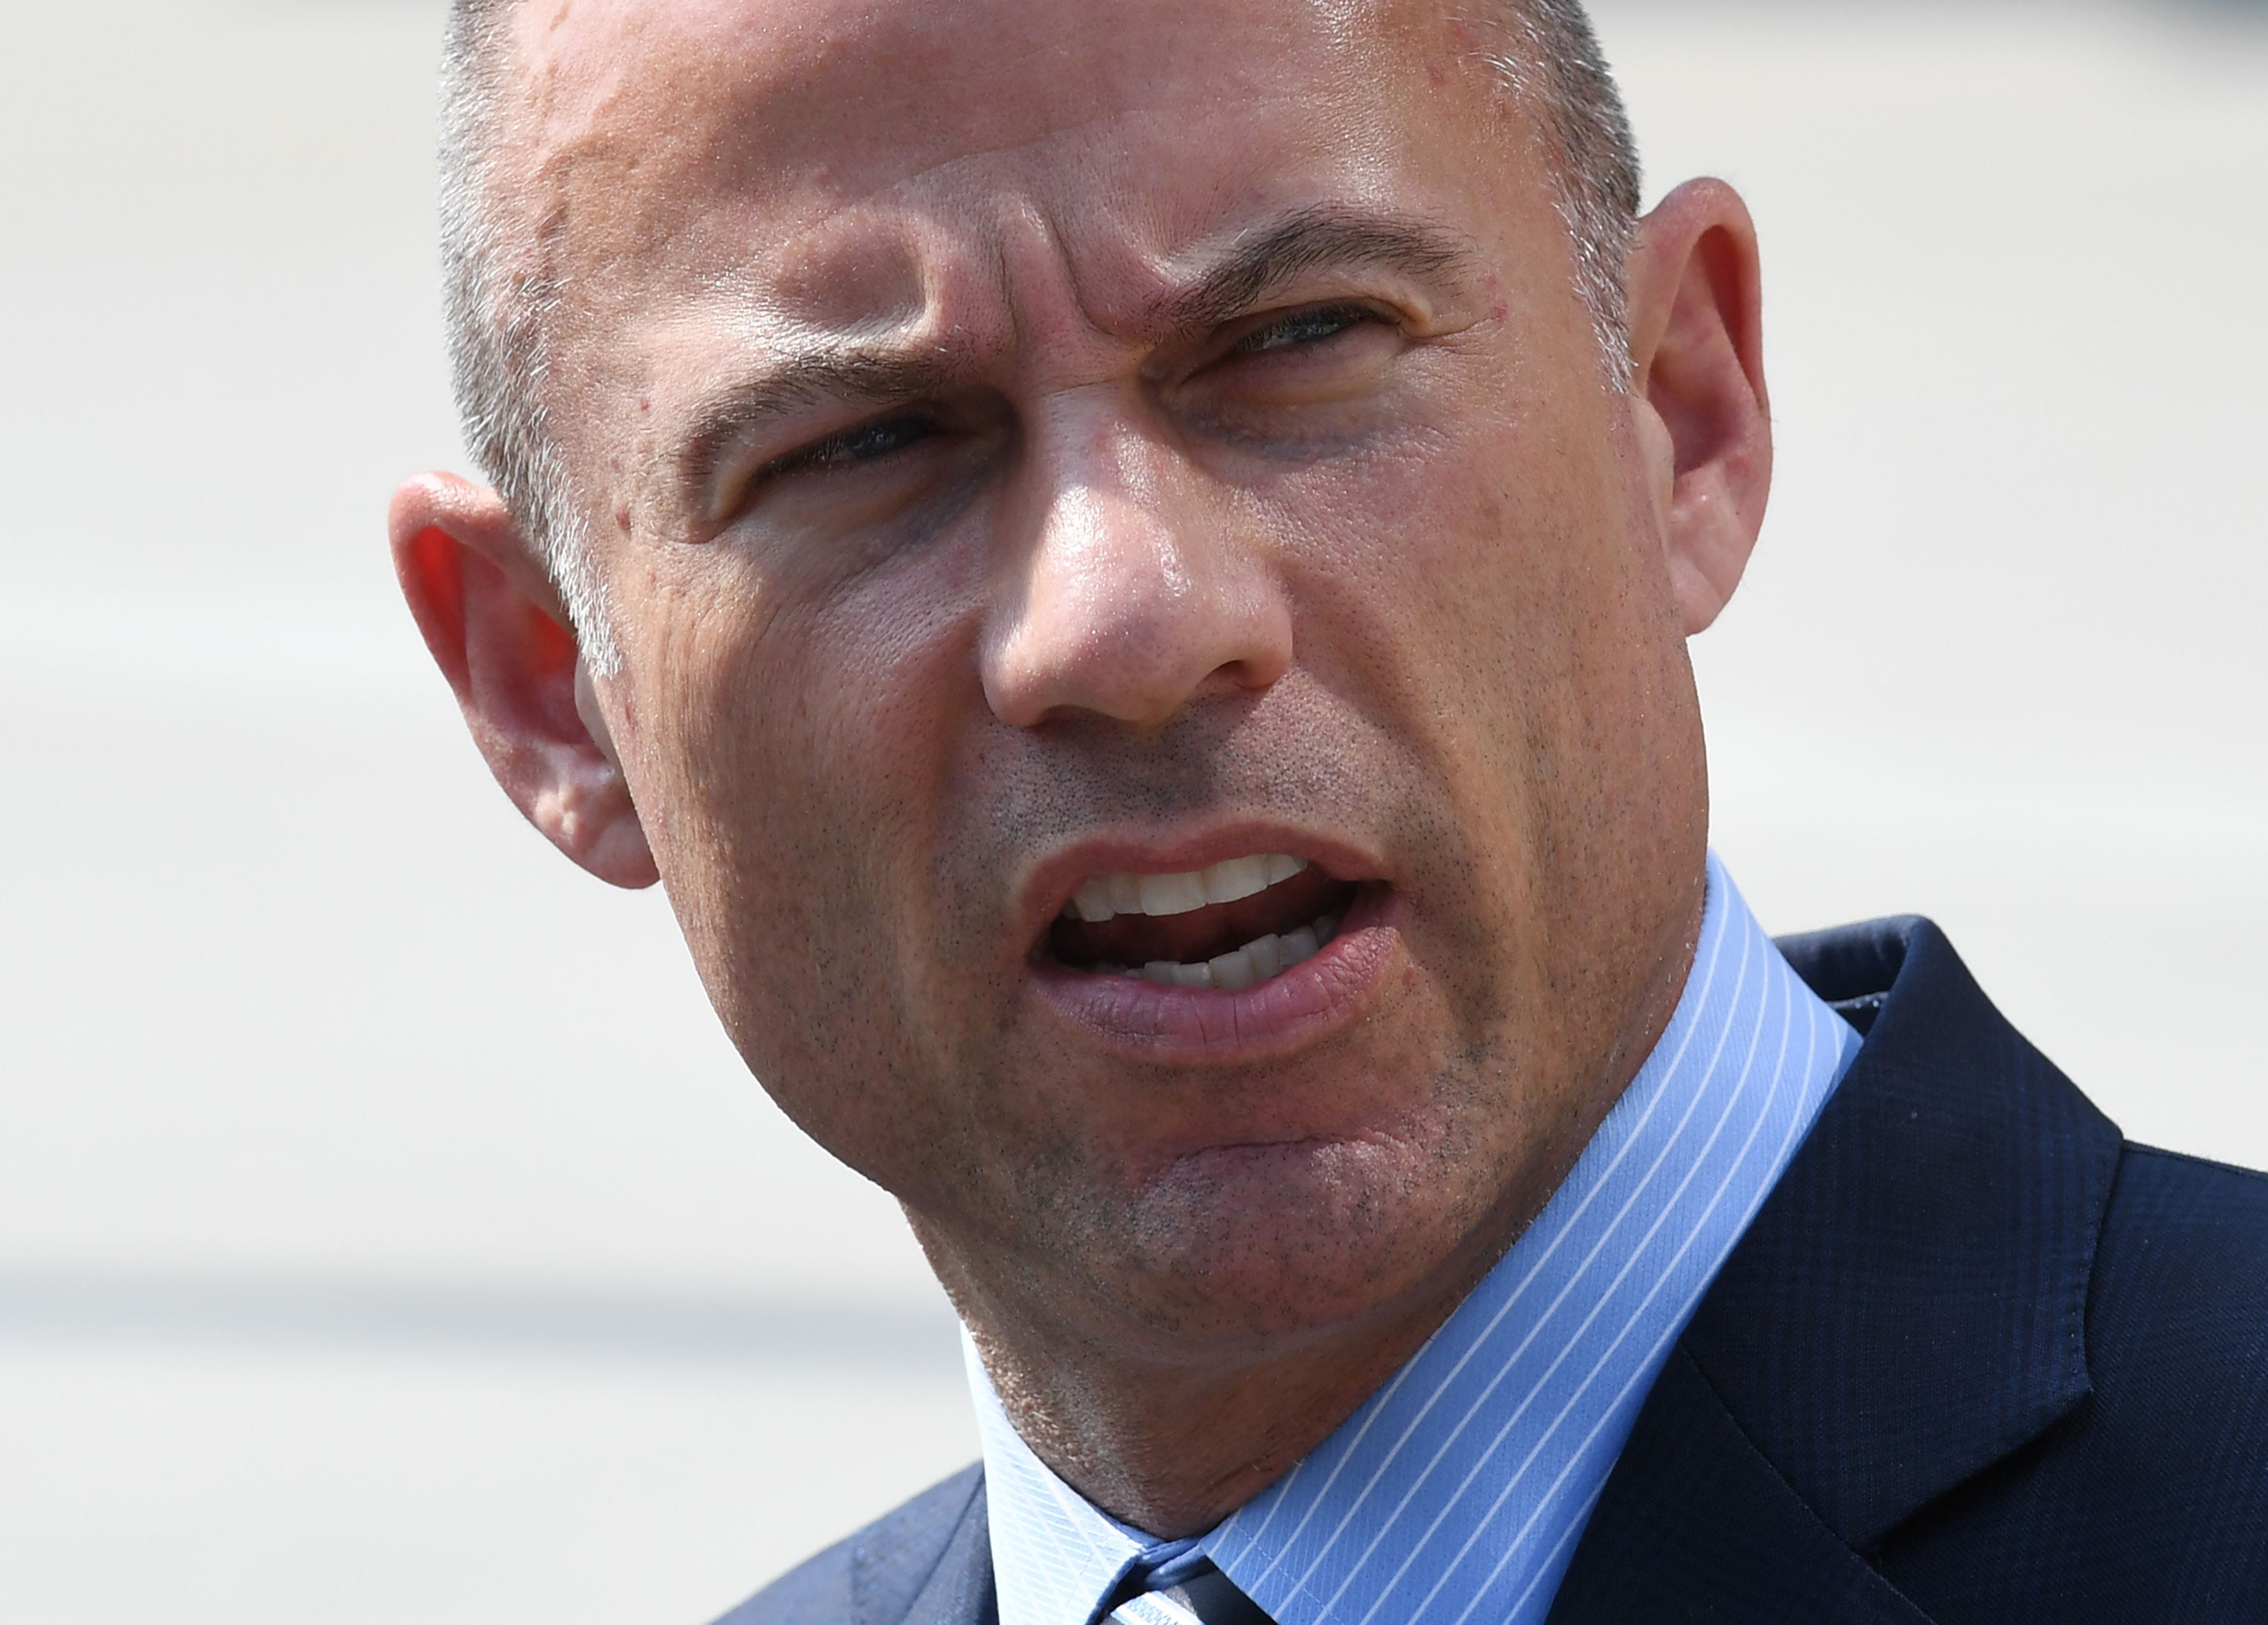 Michael Avenatti arrested over Nike case